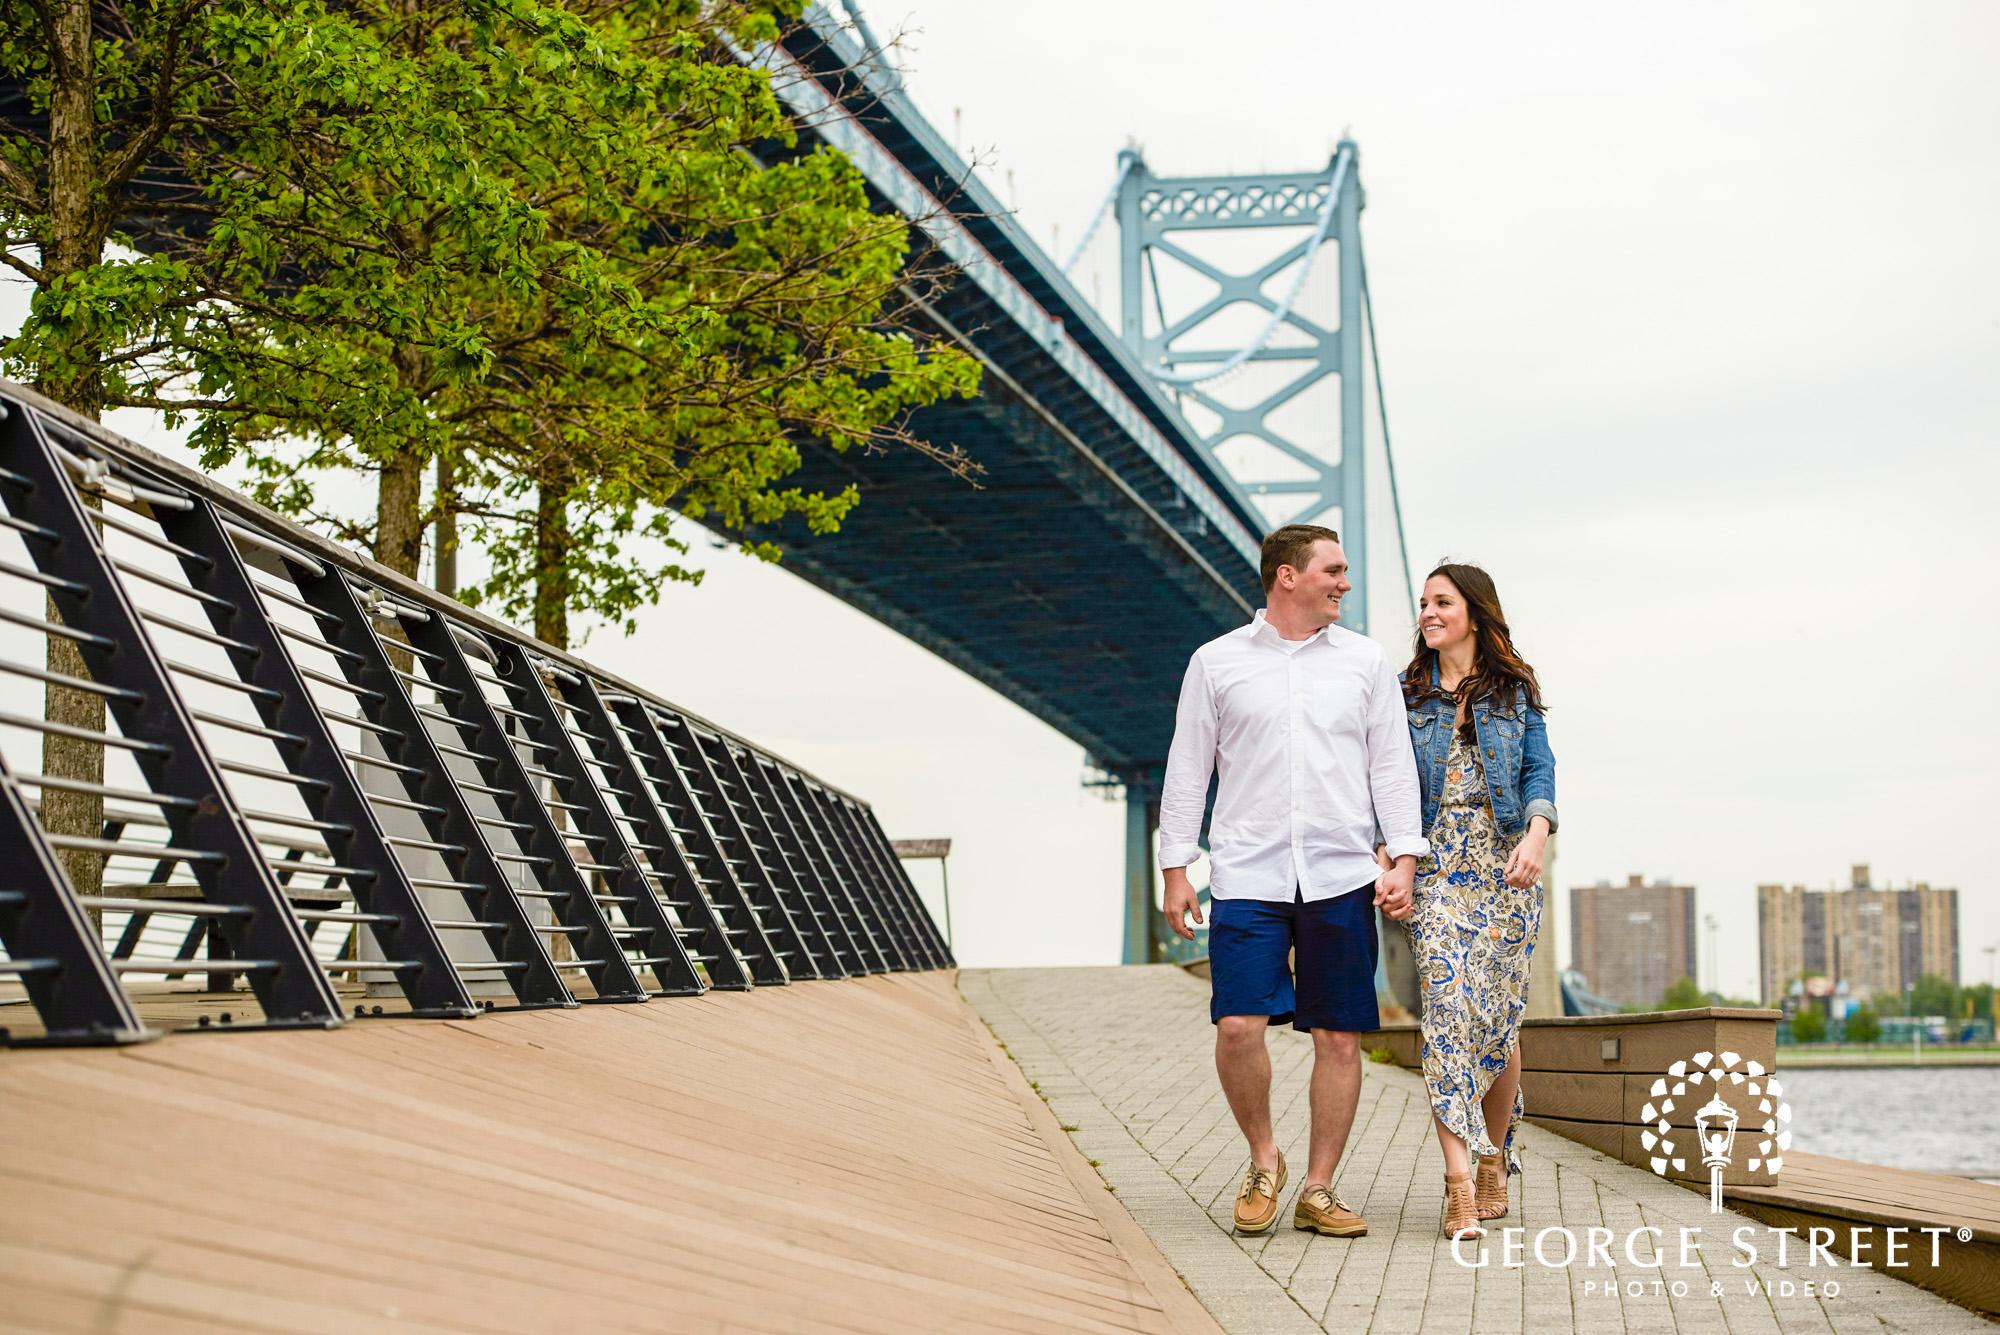 beautiful race street pier engagement photos philadelphia 4